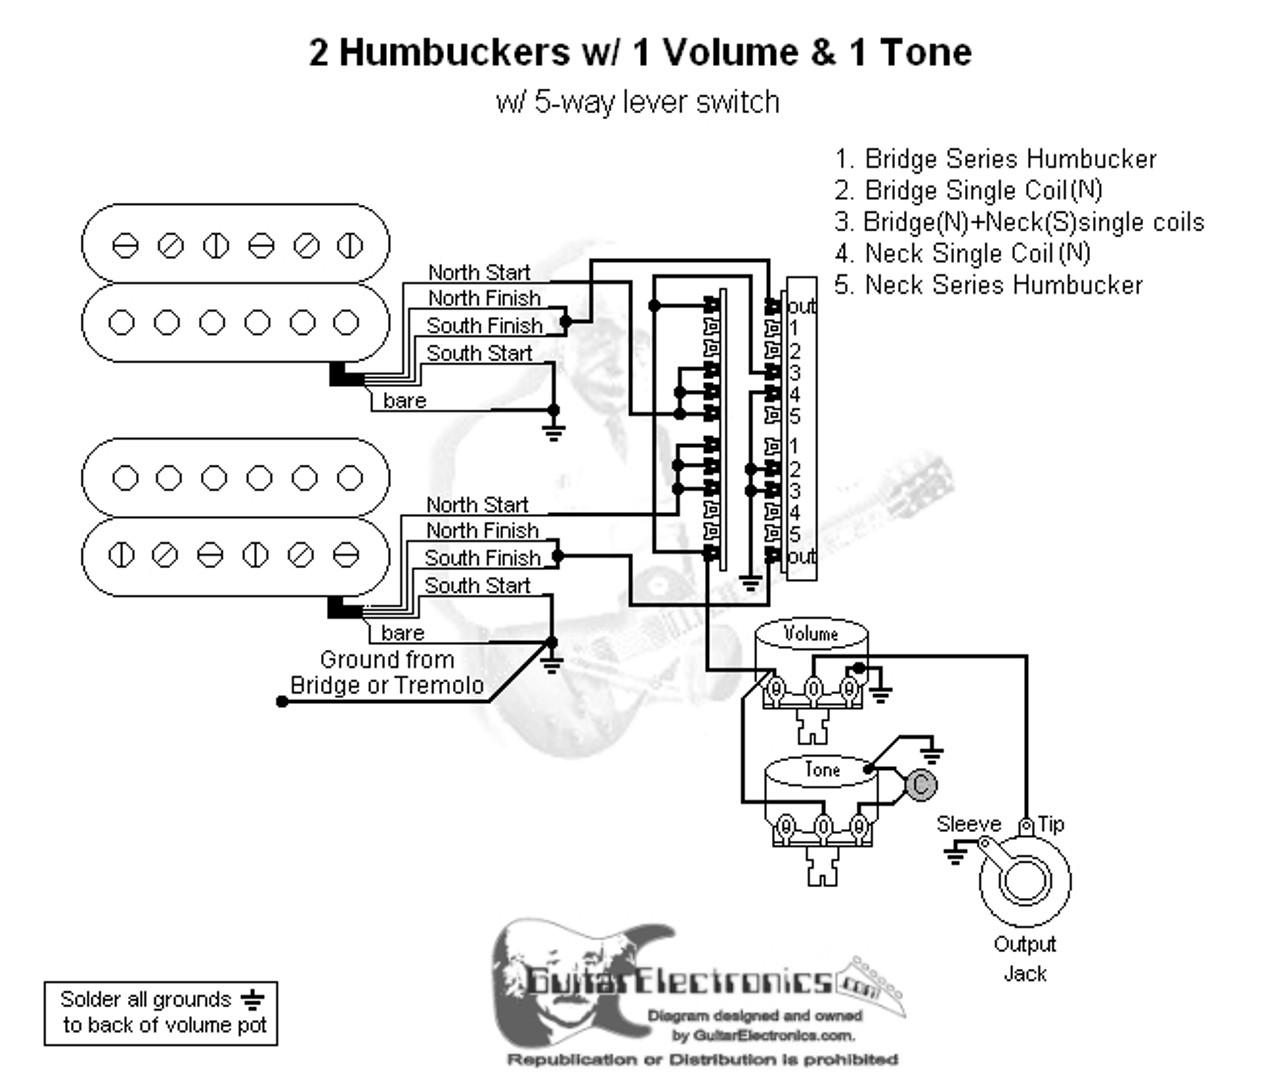 wiring diagram 2 humbuckers 1 volume 1 tone 5 way switch wiring2 humbuckers 5 way lever [ 1280 x 1083 Pixel ]